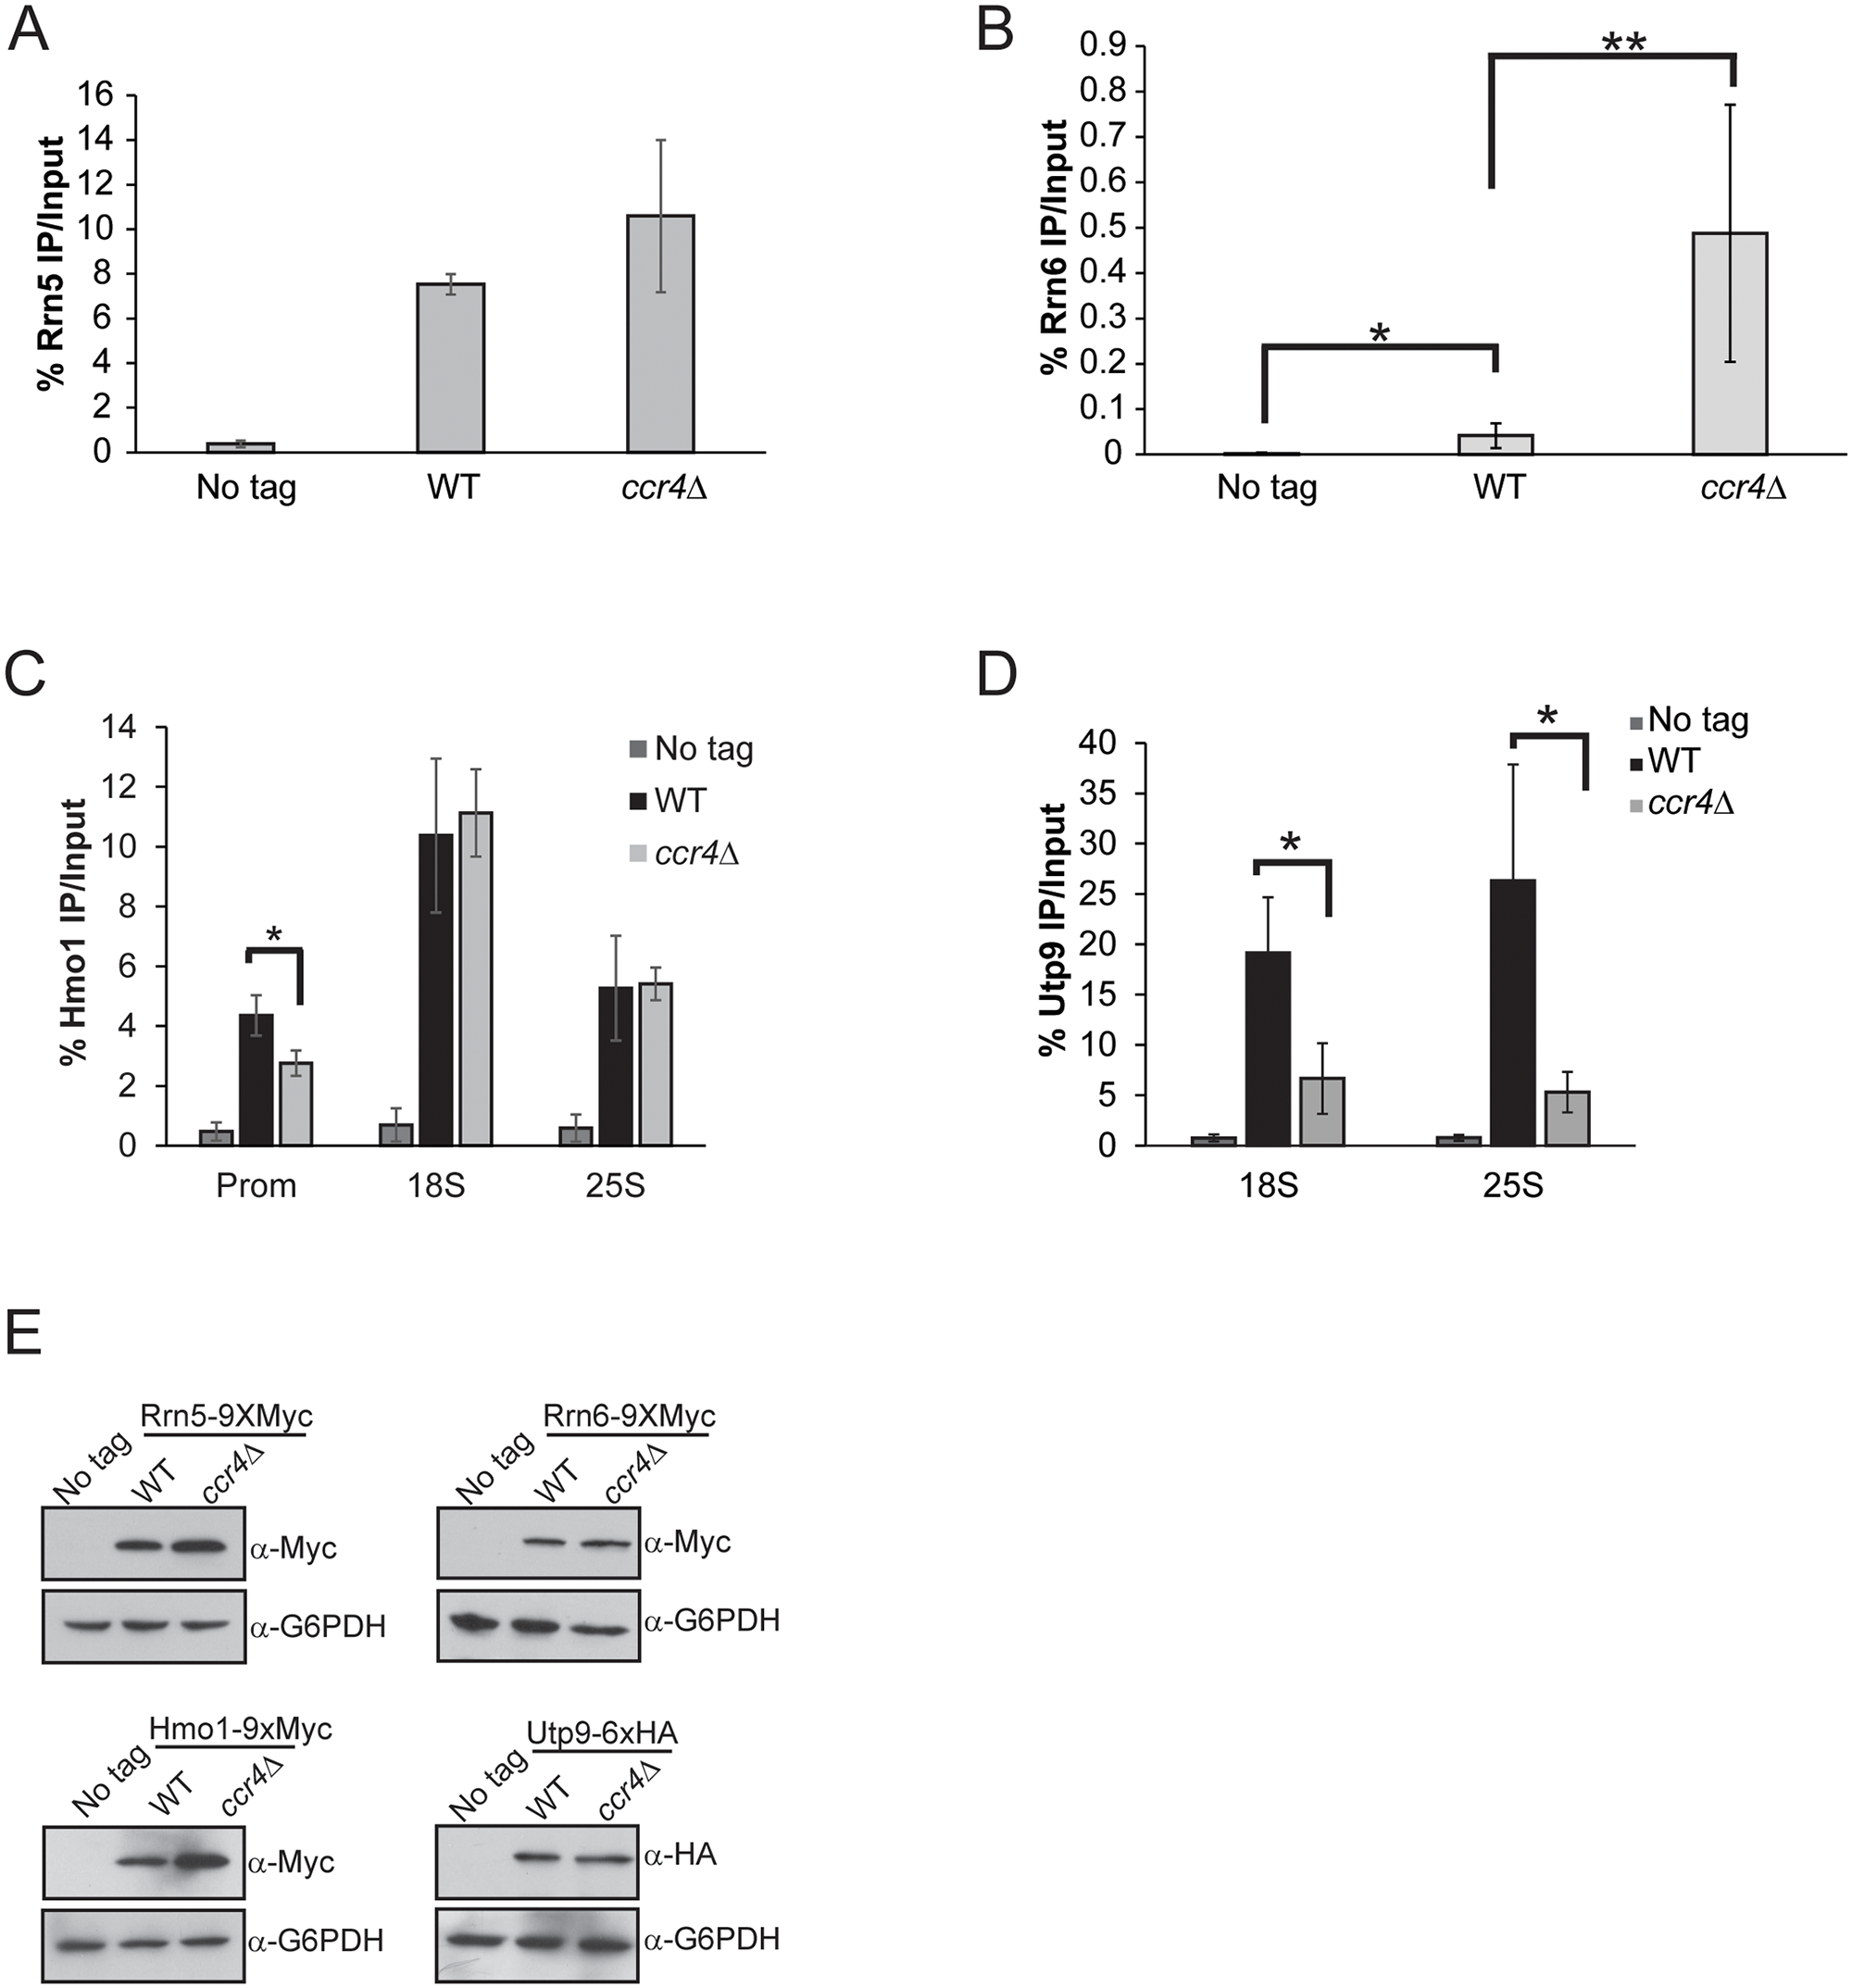 Ccr4-Not has selective effects on Pol I transcriptional regulators.